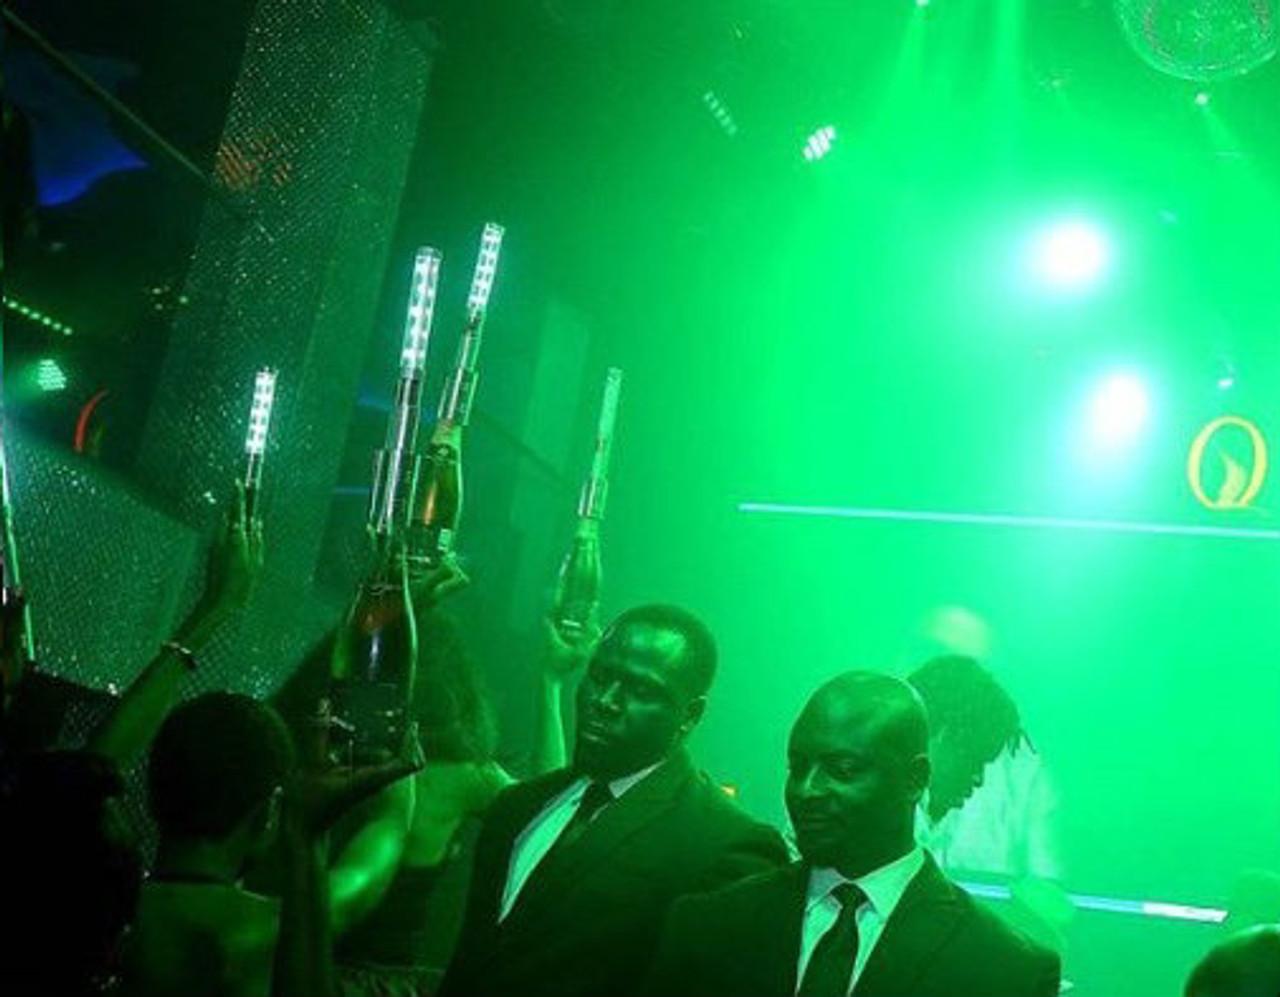 Electronic Bottle Service sparkler, Champagne Sparkler, LED sparkler, LED baton, LED Bottle Baton, LED bottle Topper, Champagne,Strobe, electronic,sparkler,bottle service,delivery,nightclub,bar,lounge,effect,flash,stick,flashing,sparkling